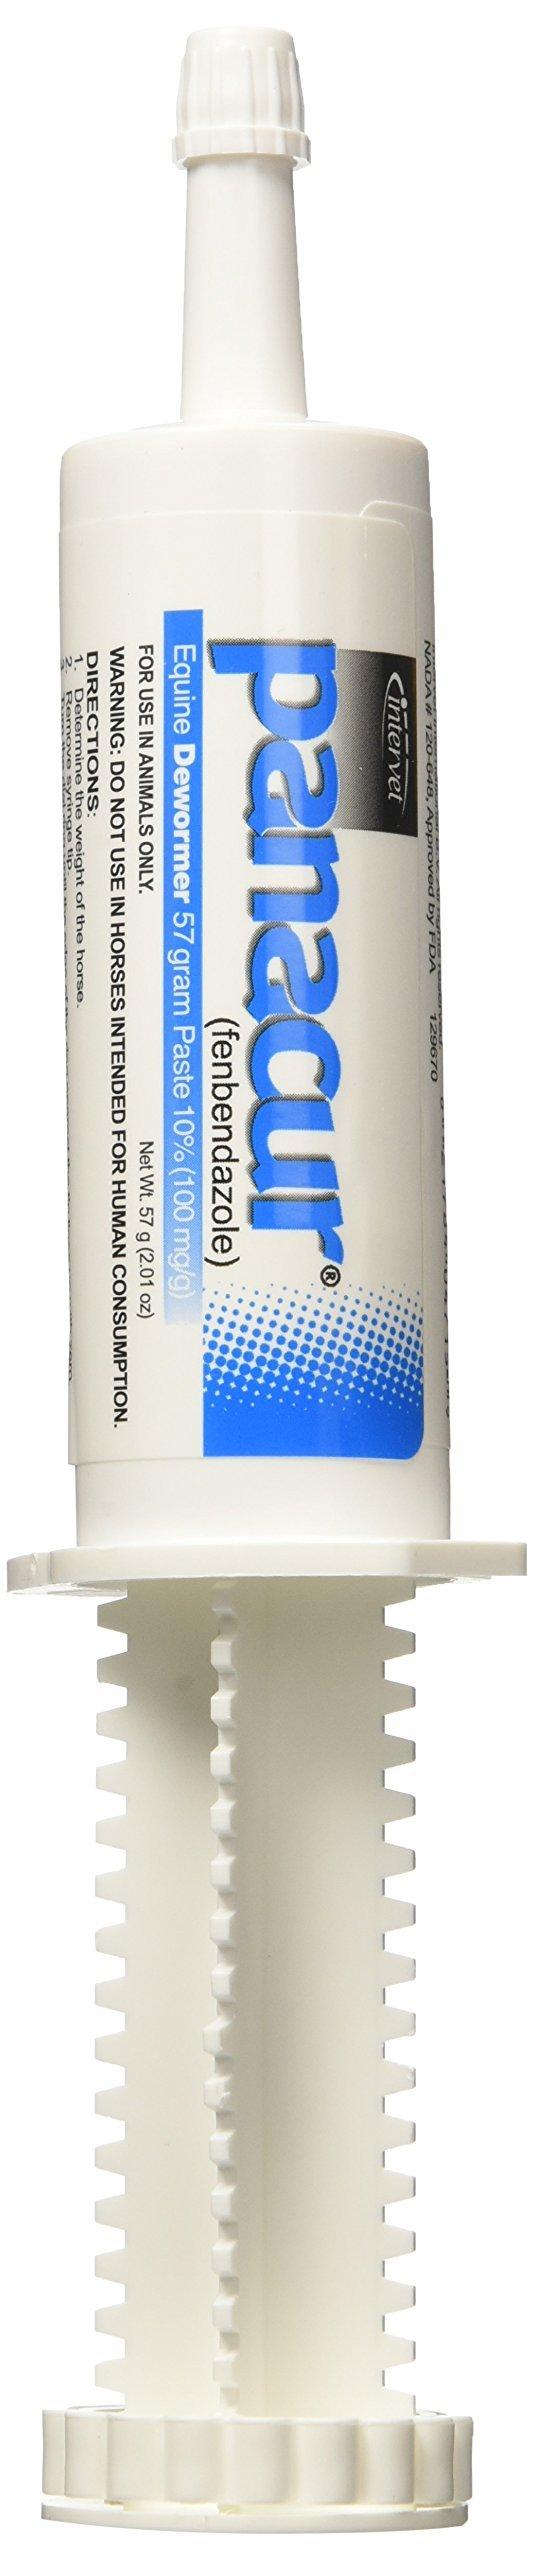 Merck Animal Health Panacur Paste 10-Percent Powerpac (5 Pack), 57 gm